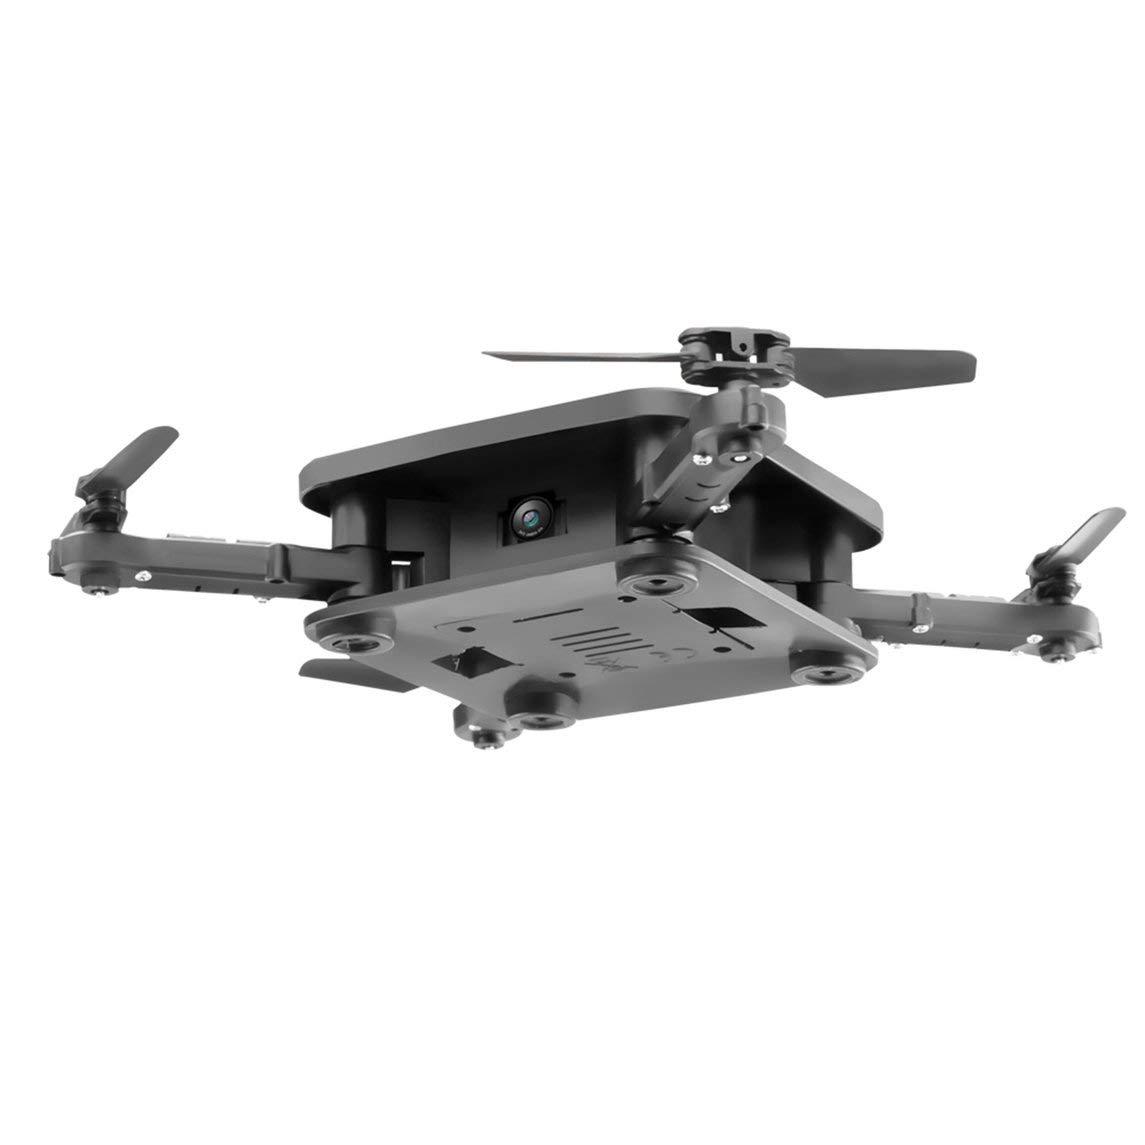 Footprintse SMRC S1 Faltbare Quadcopter Quadcopter Quadcopter Mini Wi-Fi RC Drone mit 0.3MP Kamera Höhe Halten Headless-Modus Schwerkraft-Sensor APP Control 79dd2c